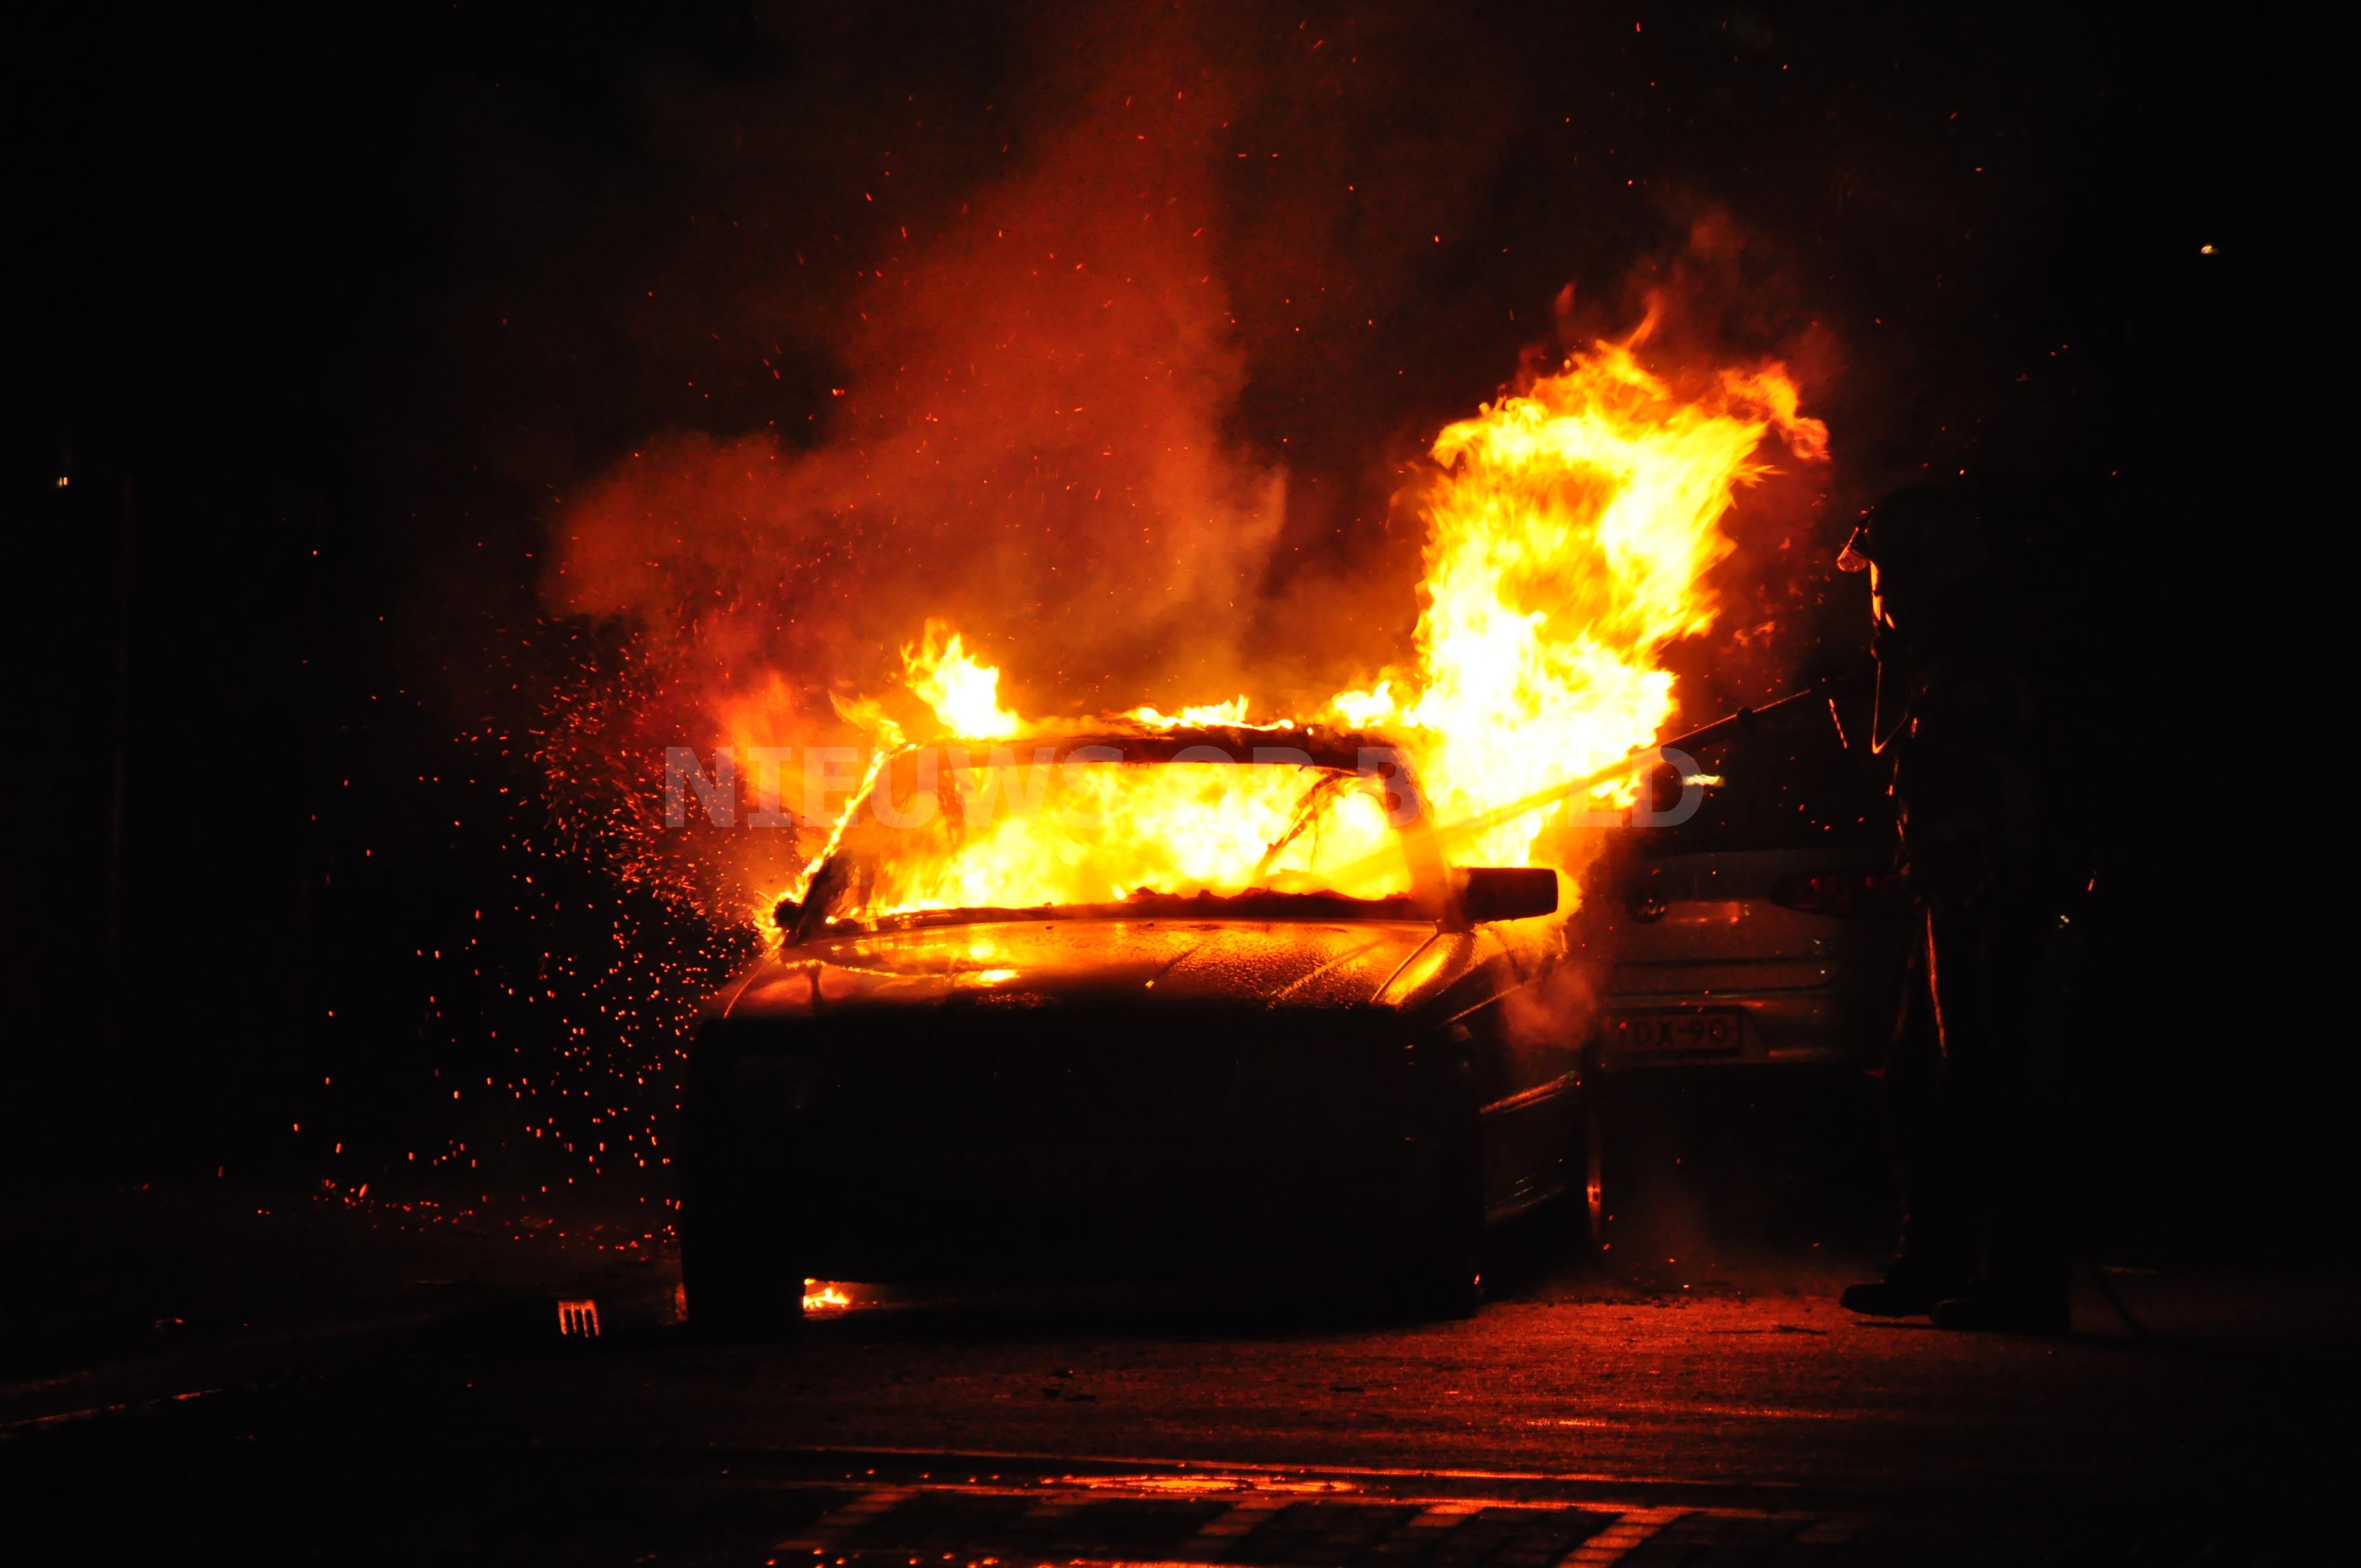 Auto met LGP-tank in vlammen op na brandstichting Emelenkamp Rotterdam